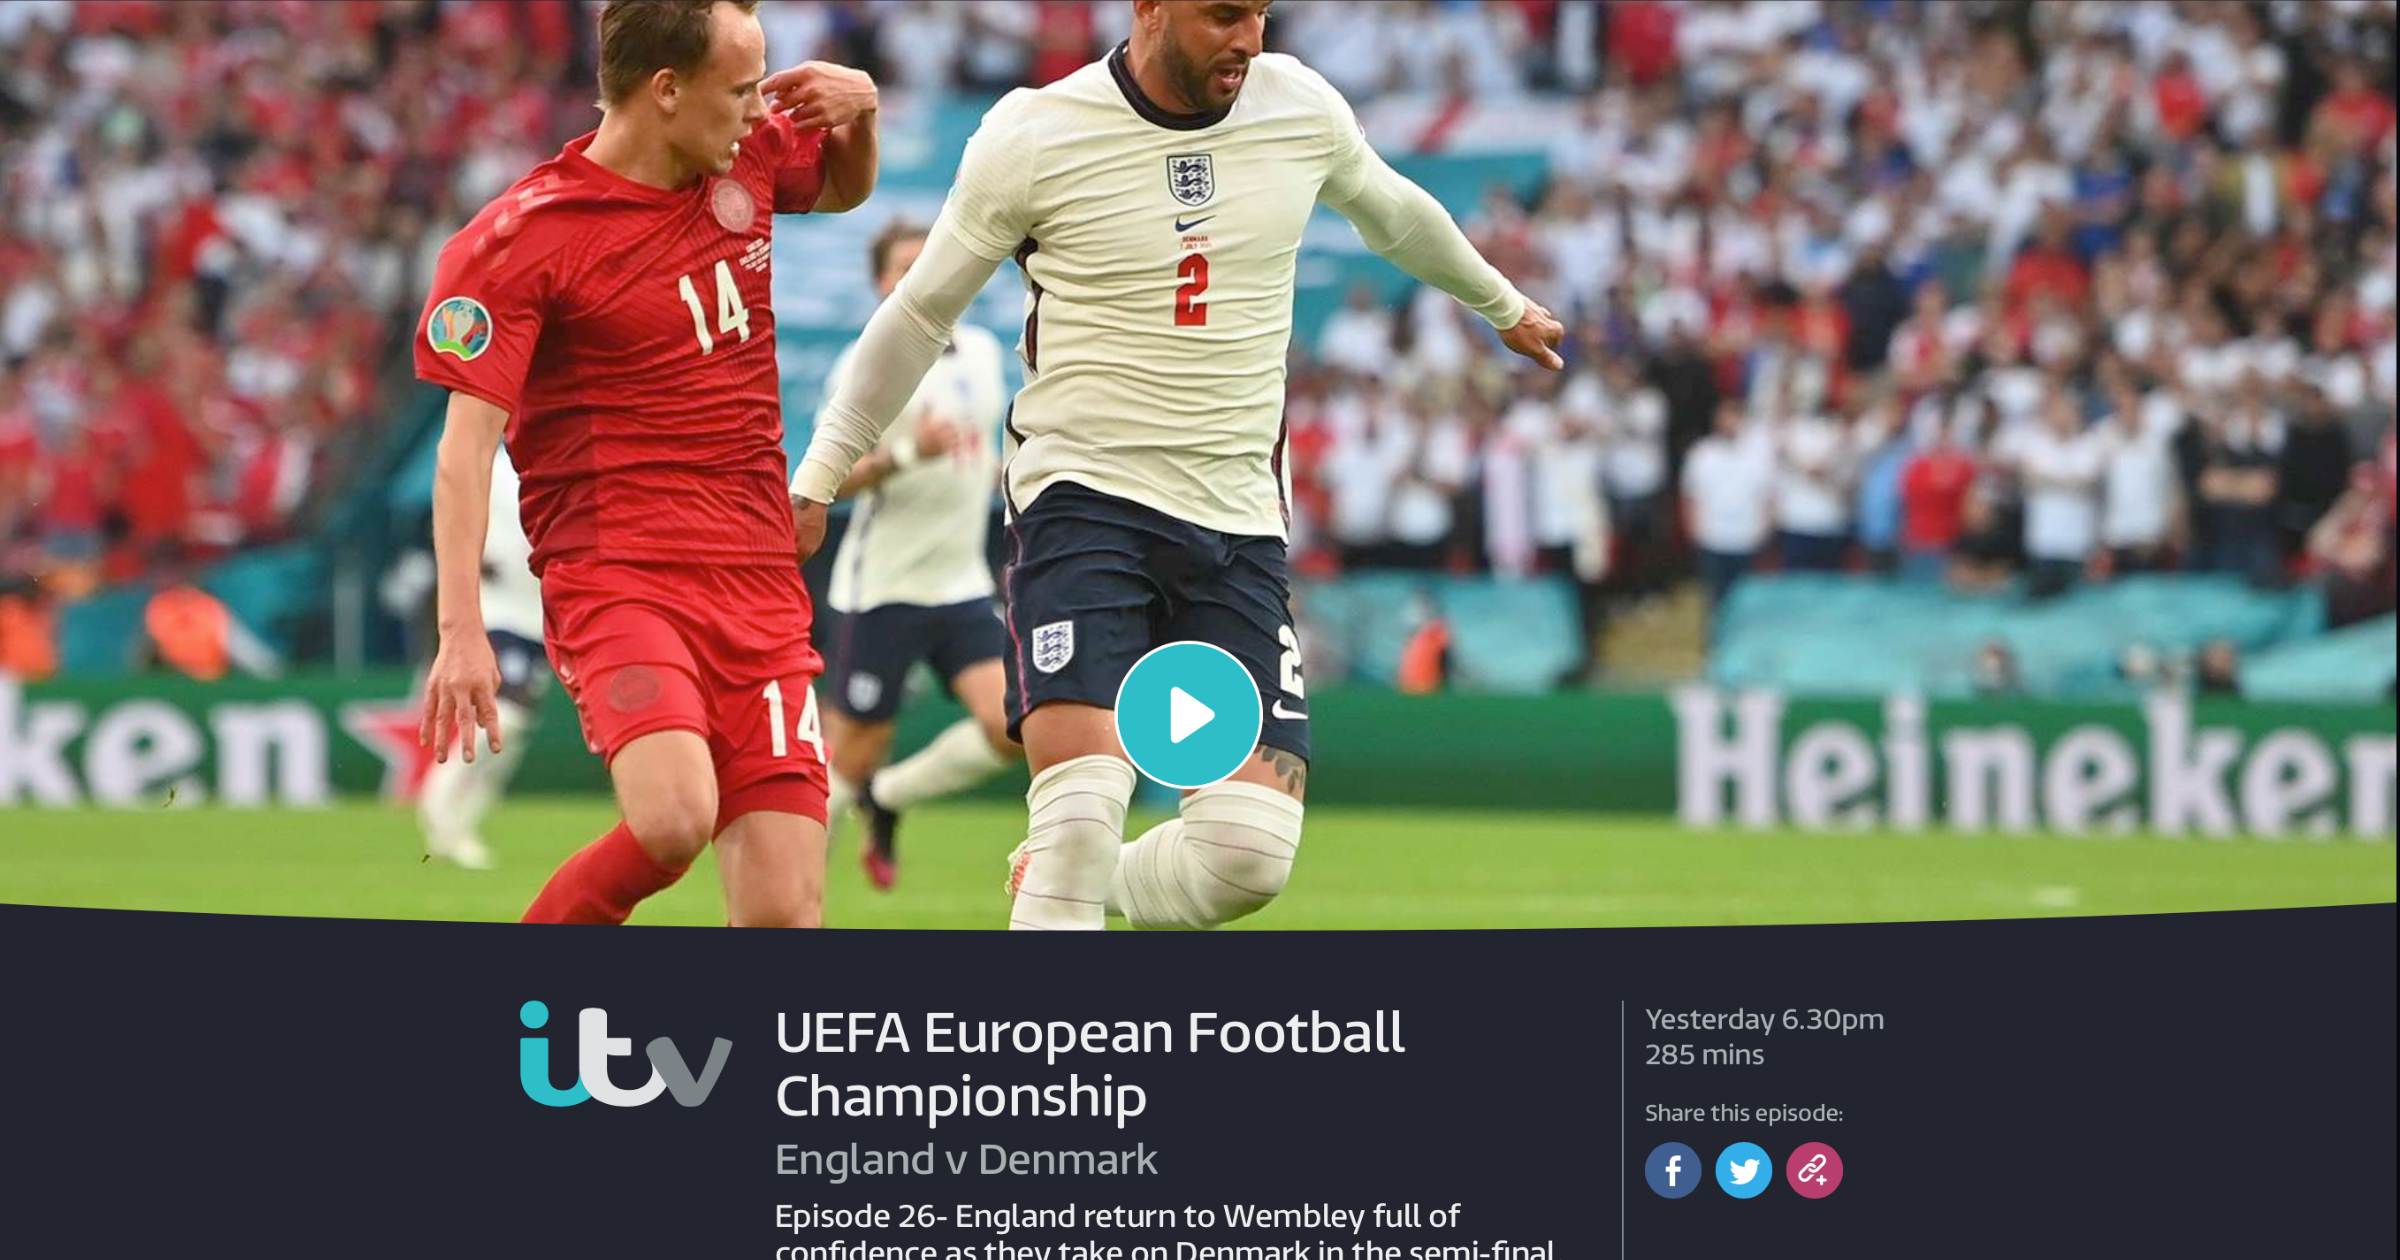 ITV England vs Denmark